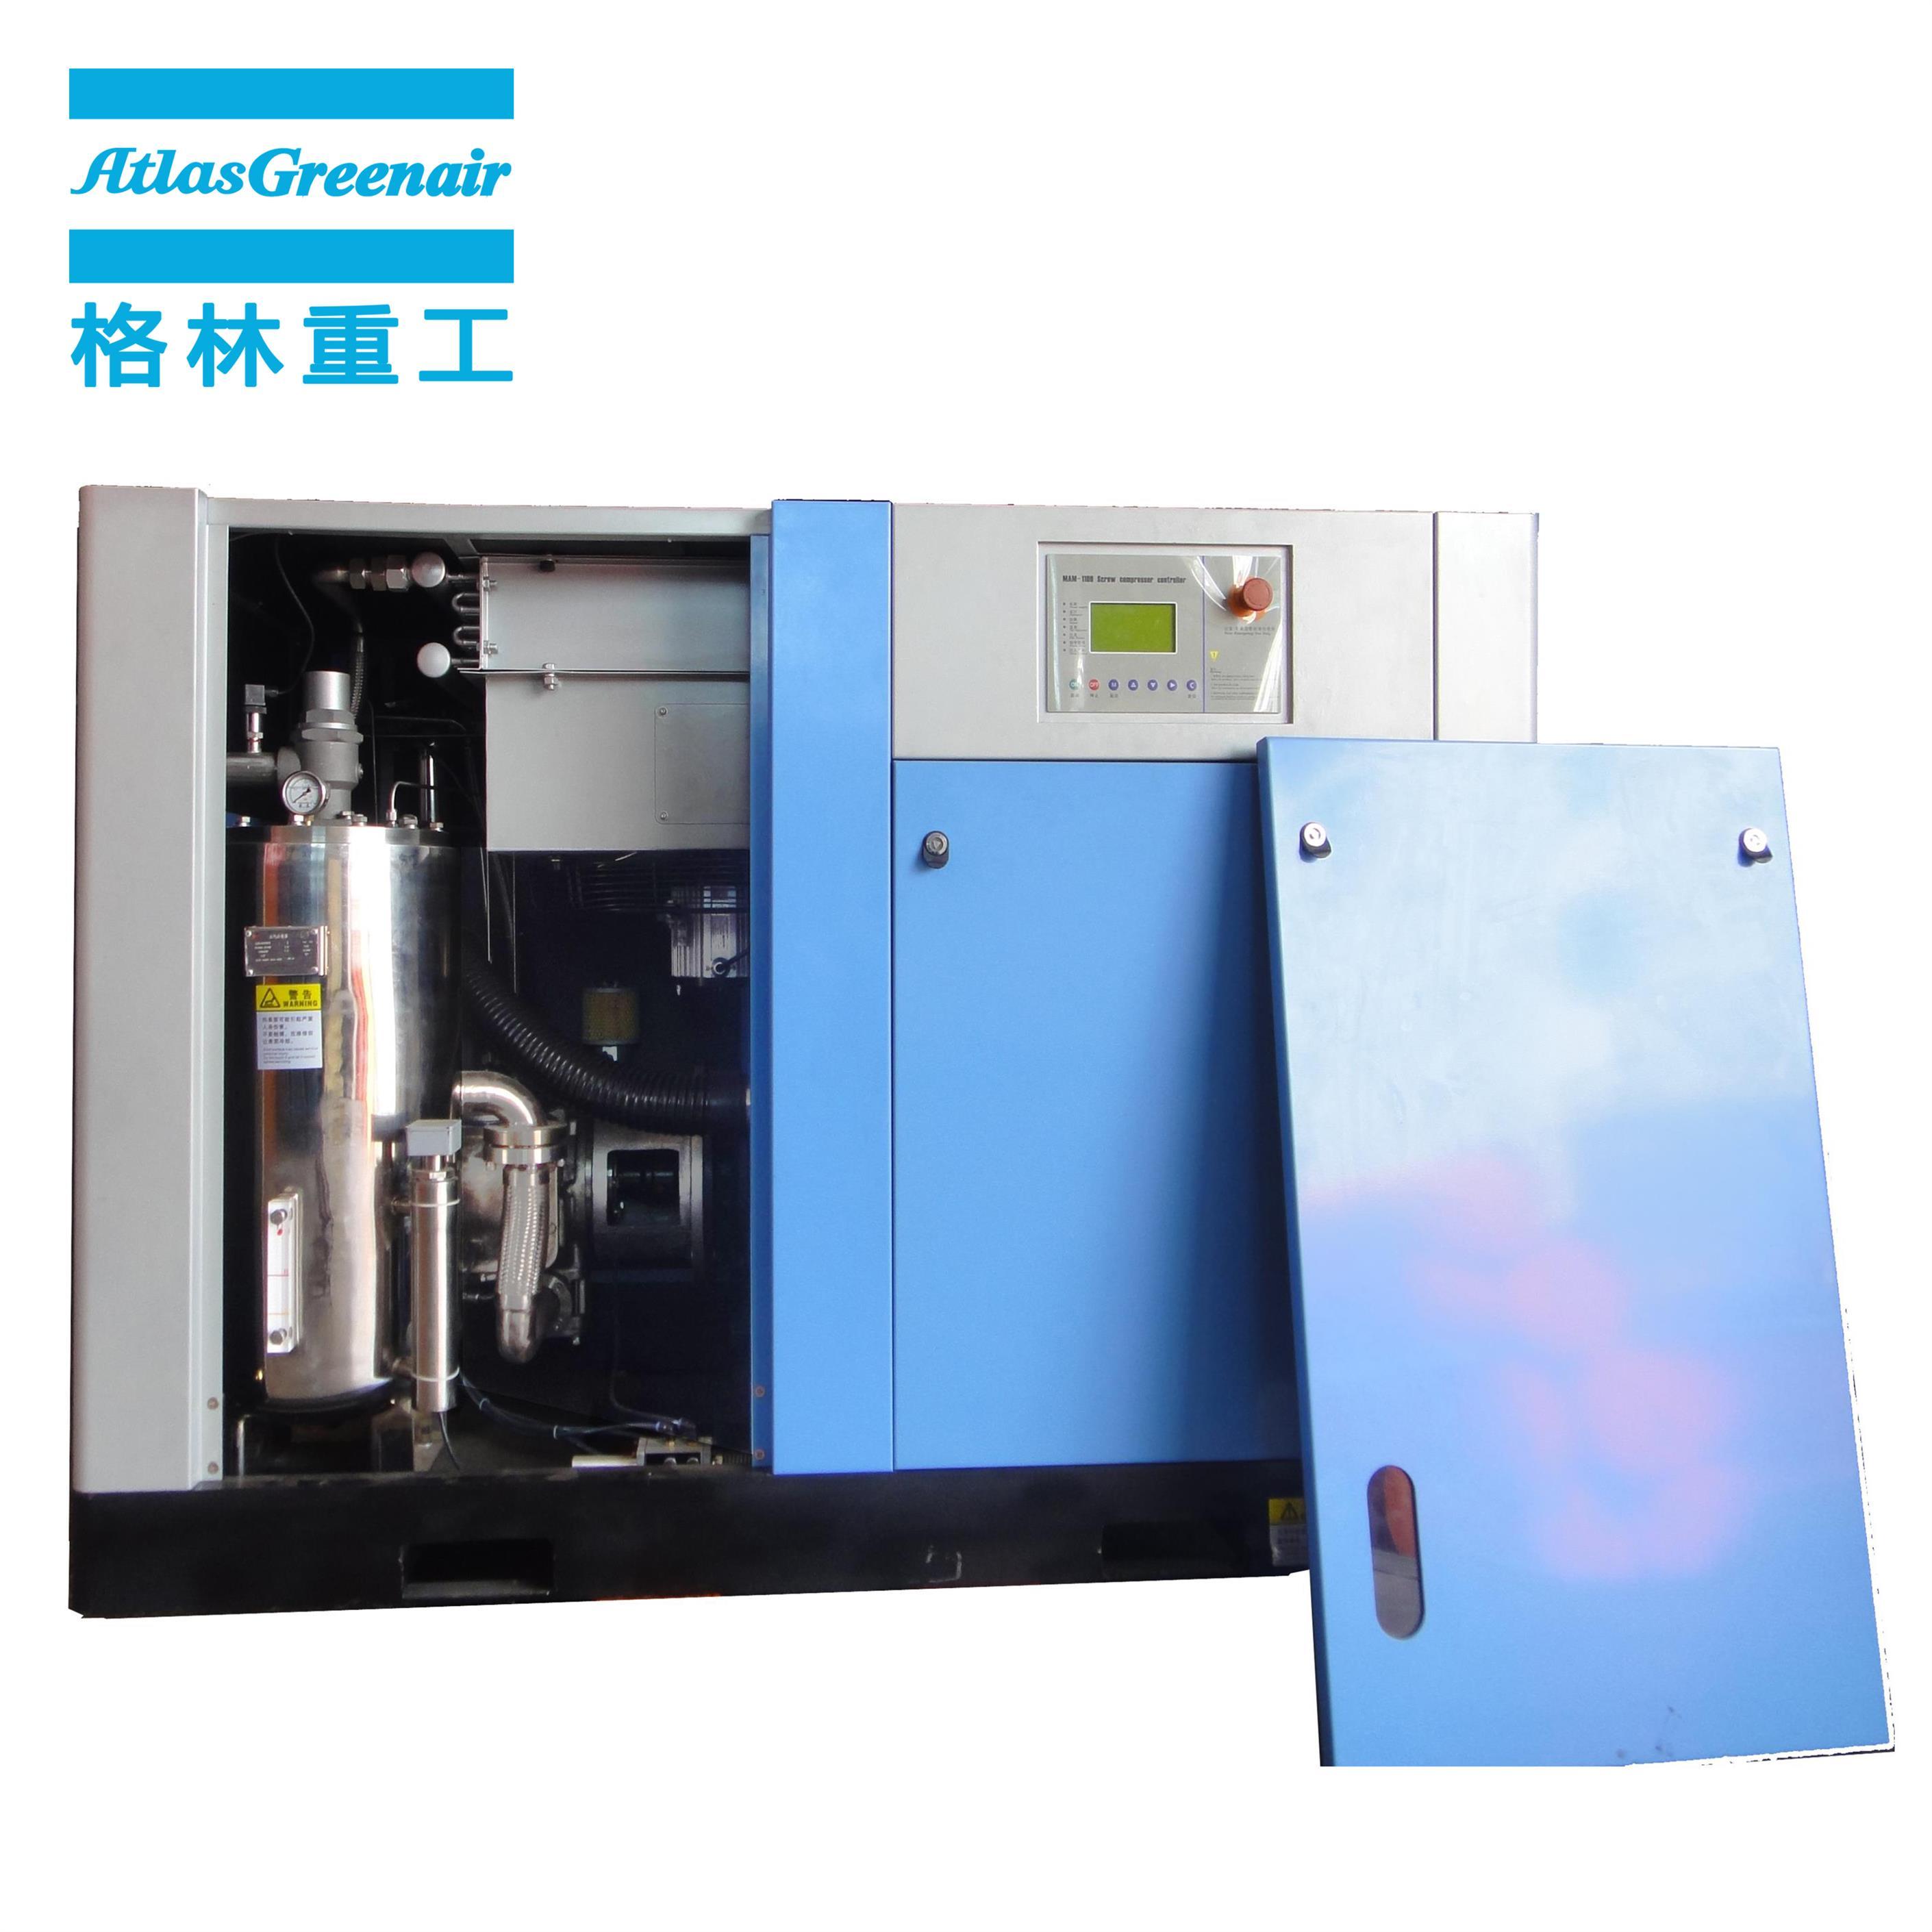 Atlas Greenair Screw Air Compressor popular oil free rotary screw air compressor factory for sale-1